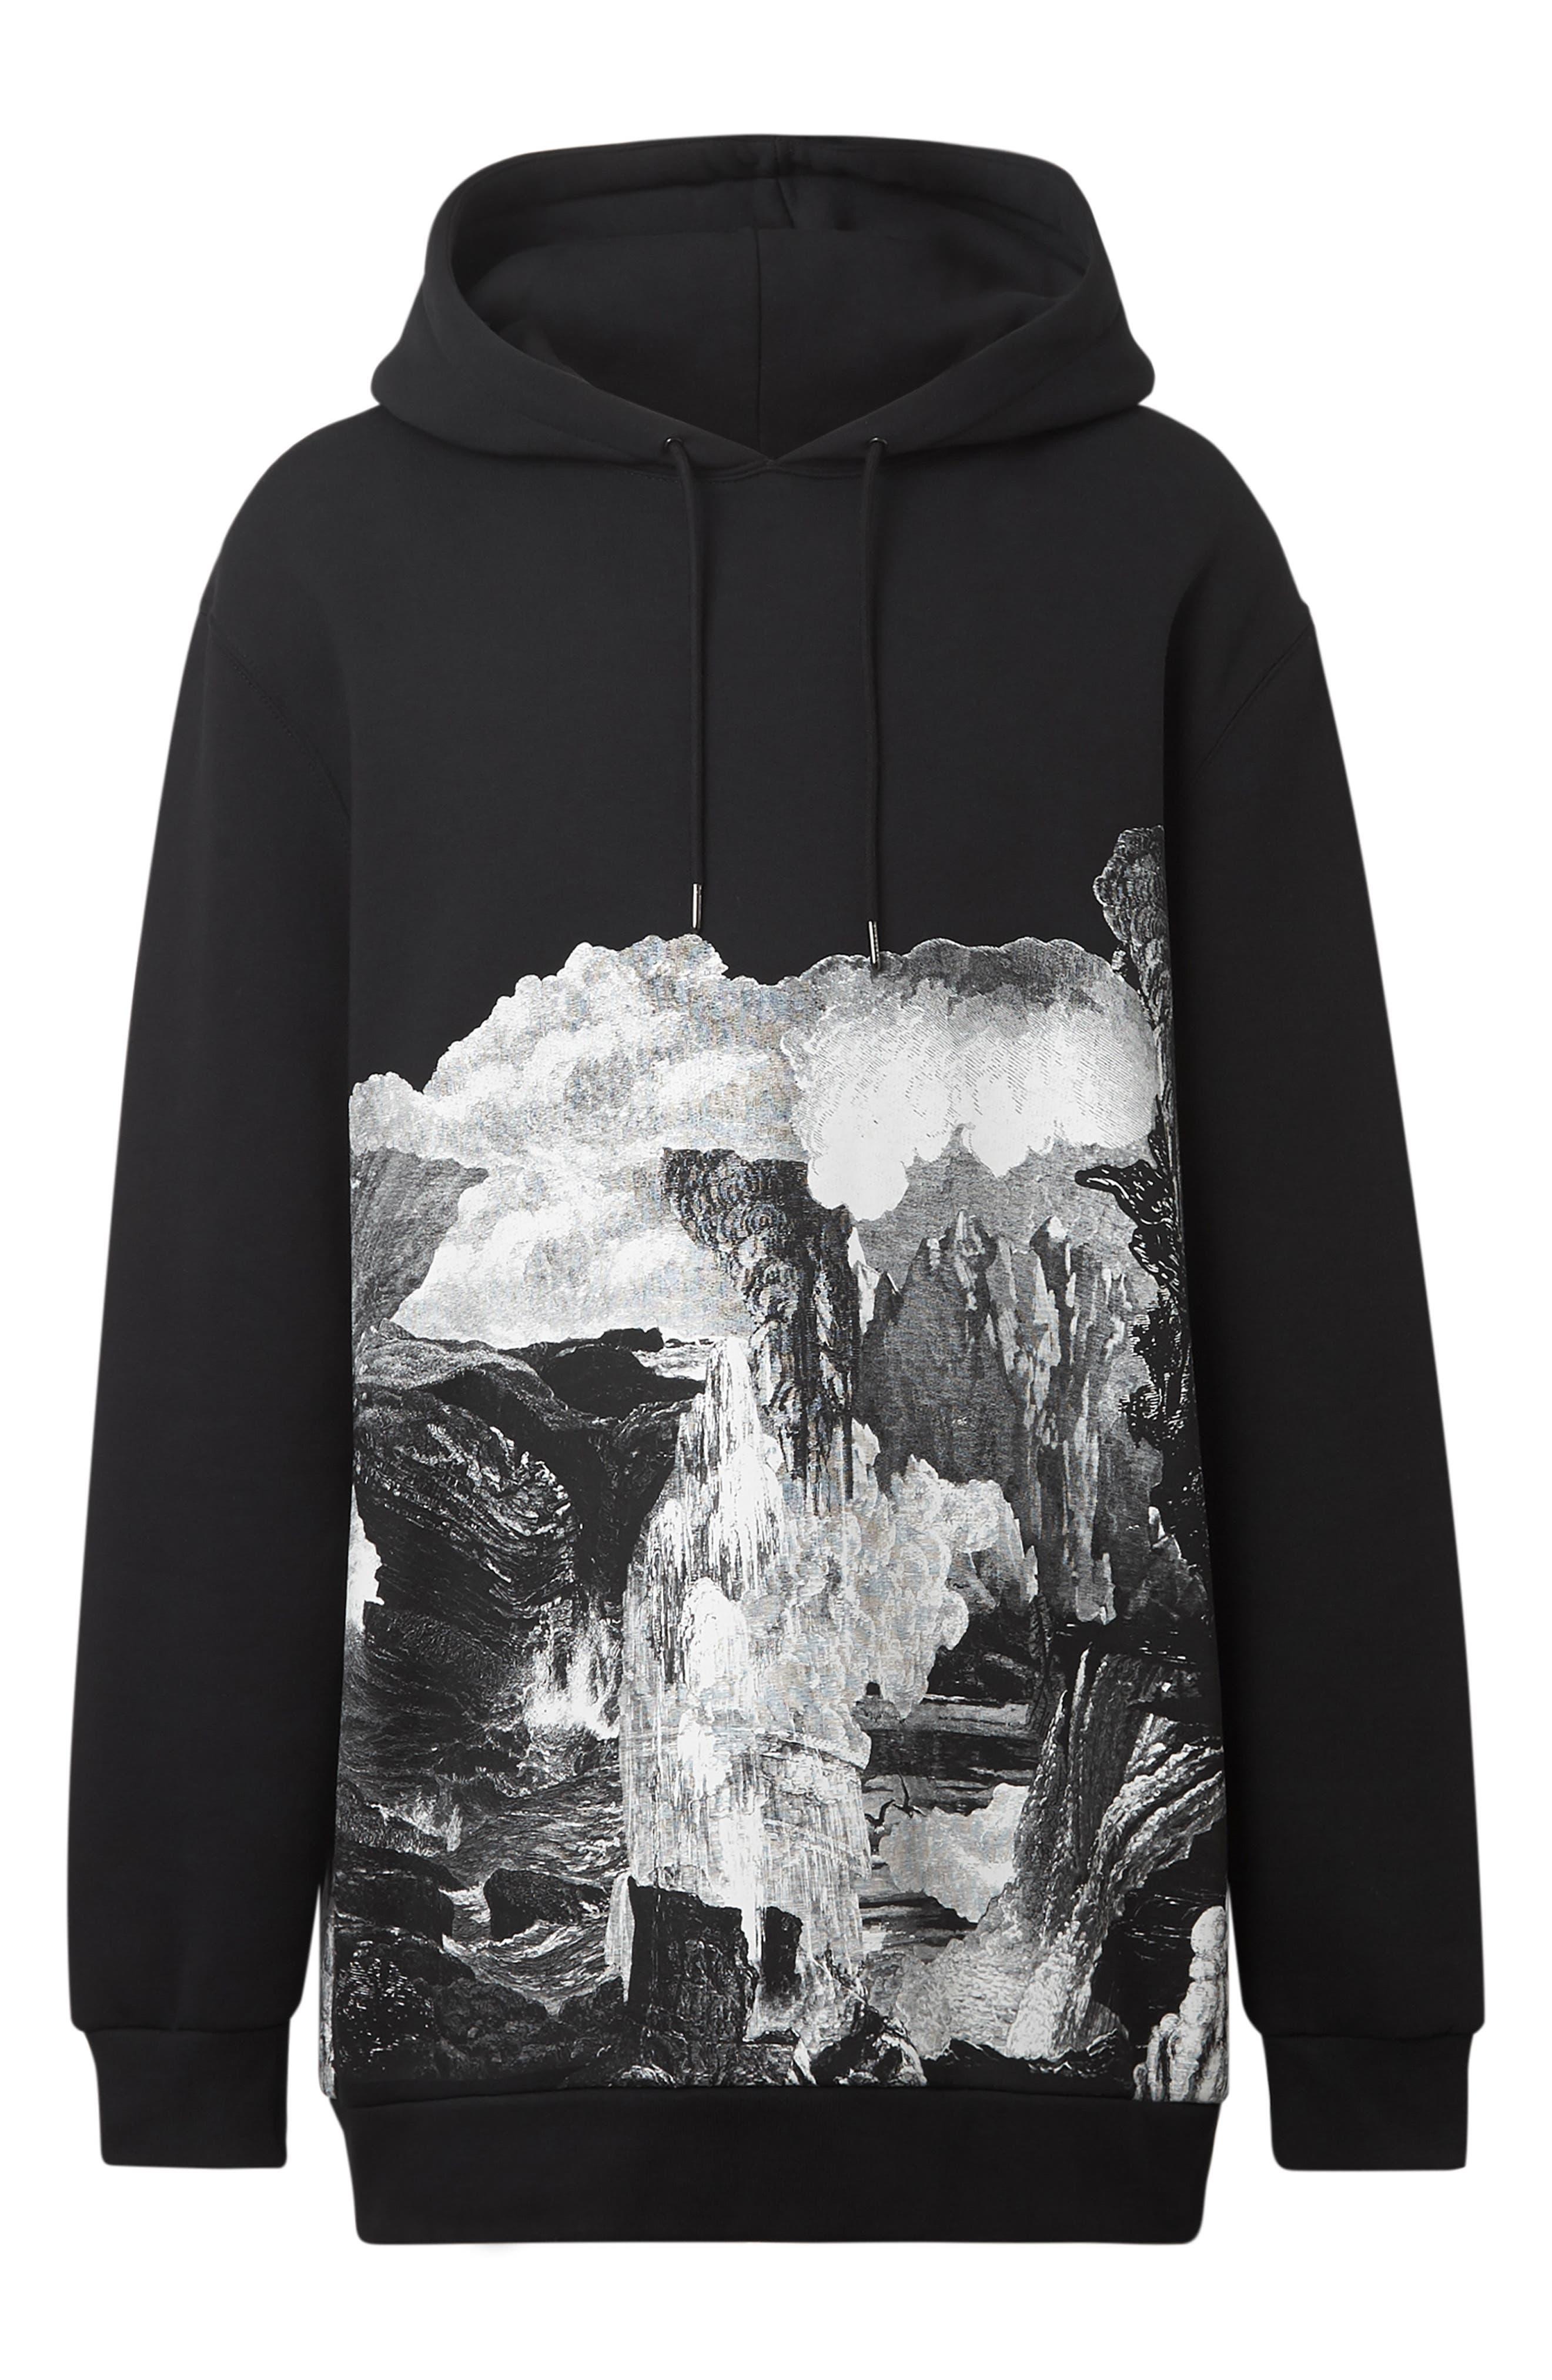 BURBERRY, Dreamscape Print Hooded Sweatshirt, Alternate thumbnail 5, color, BLACK